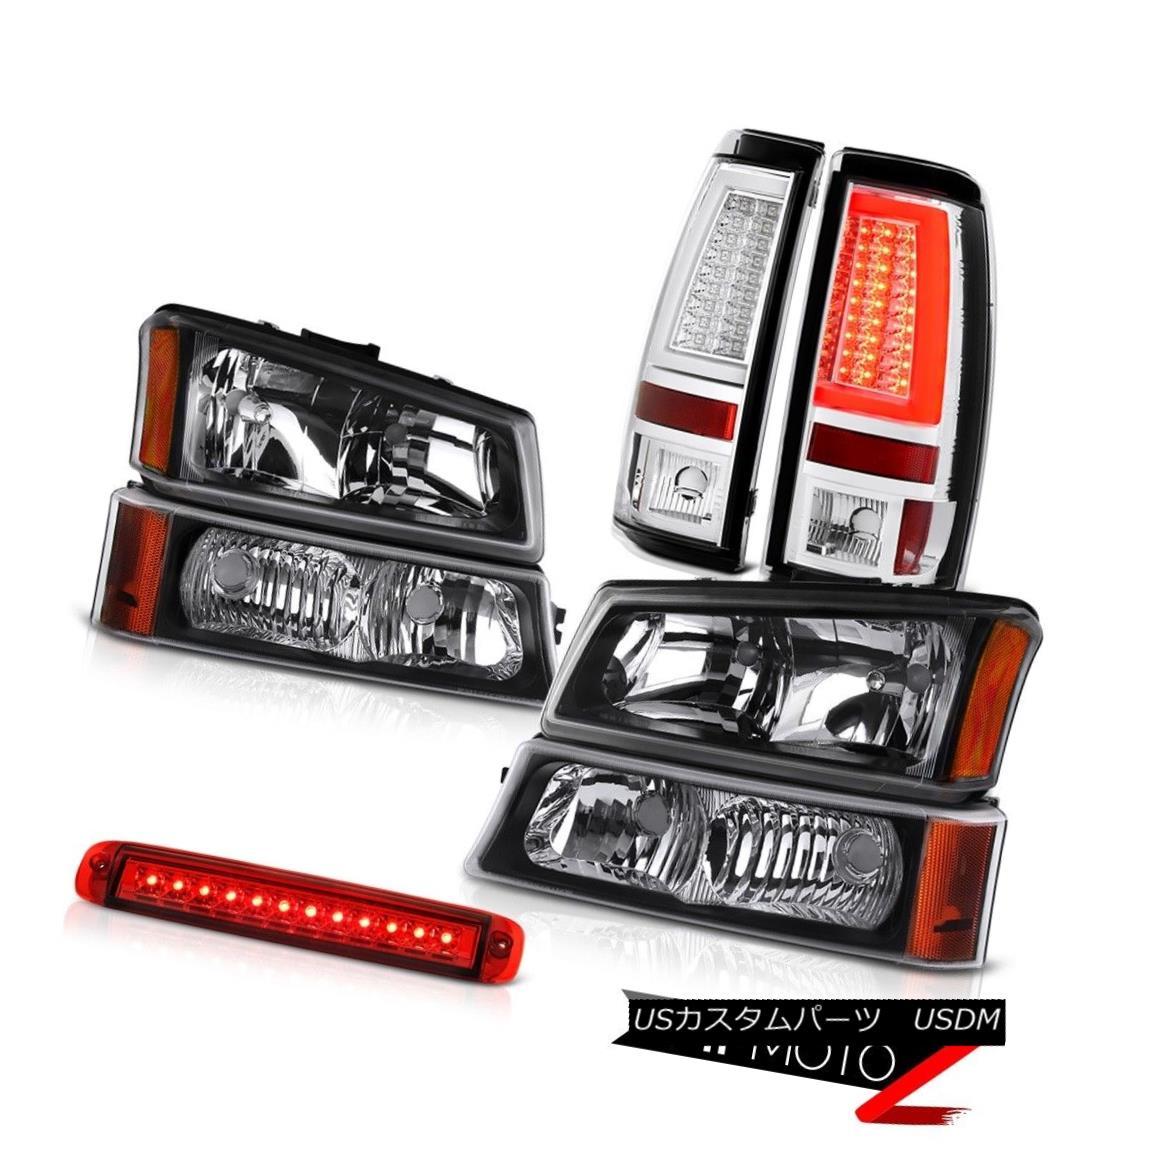 NEW LEFT TURN SIGNAL LIGHT FITS CHEVROLET SILVERADO 1500 HD 2003 05-06 GM2520185